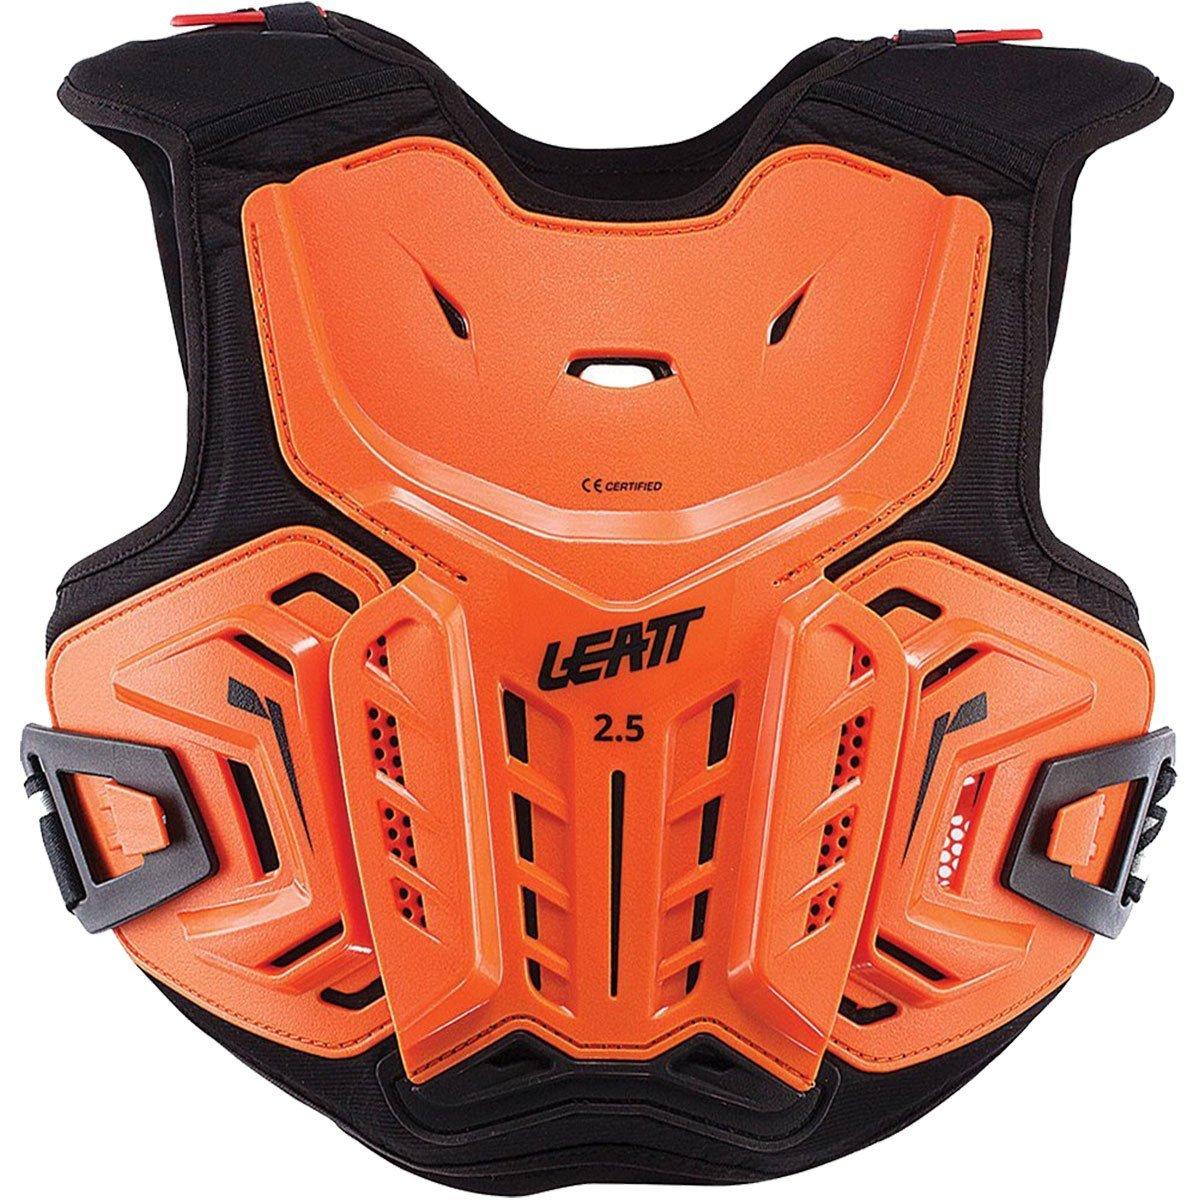 S//M Leatt Kids Brustpanzer 2.5 Gelb Gr